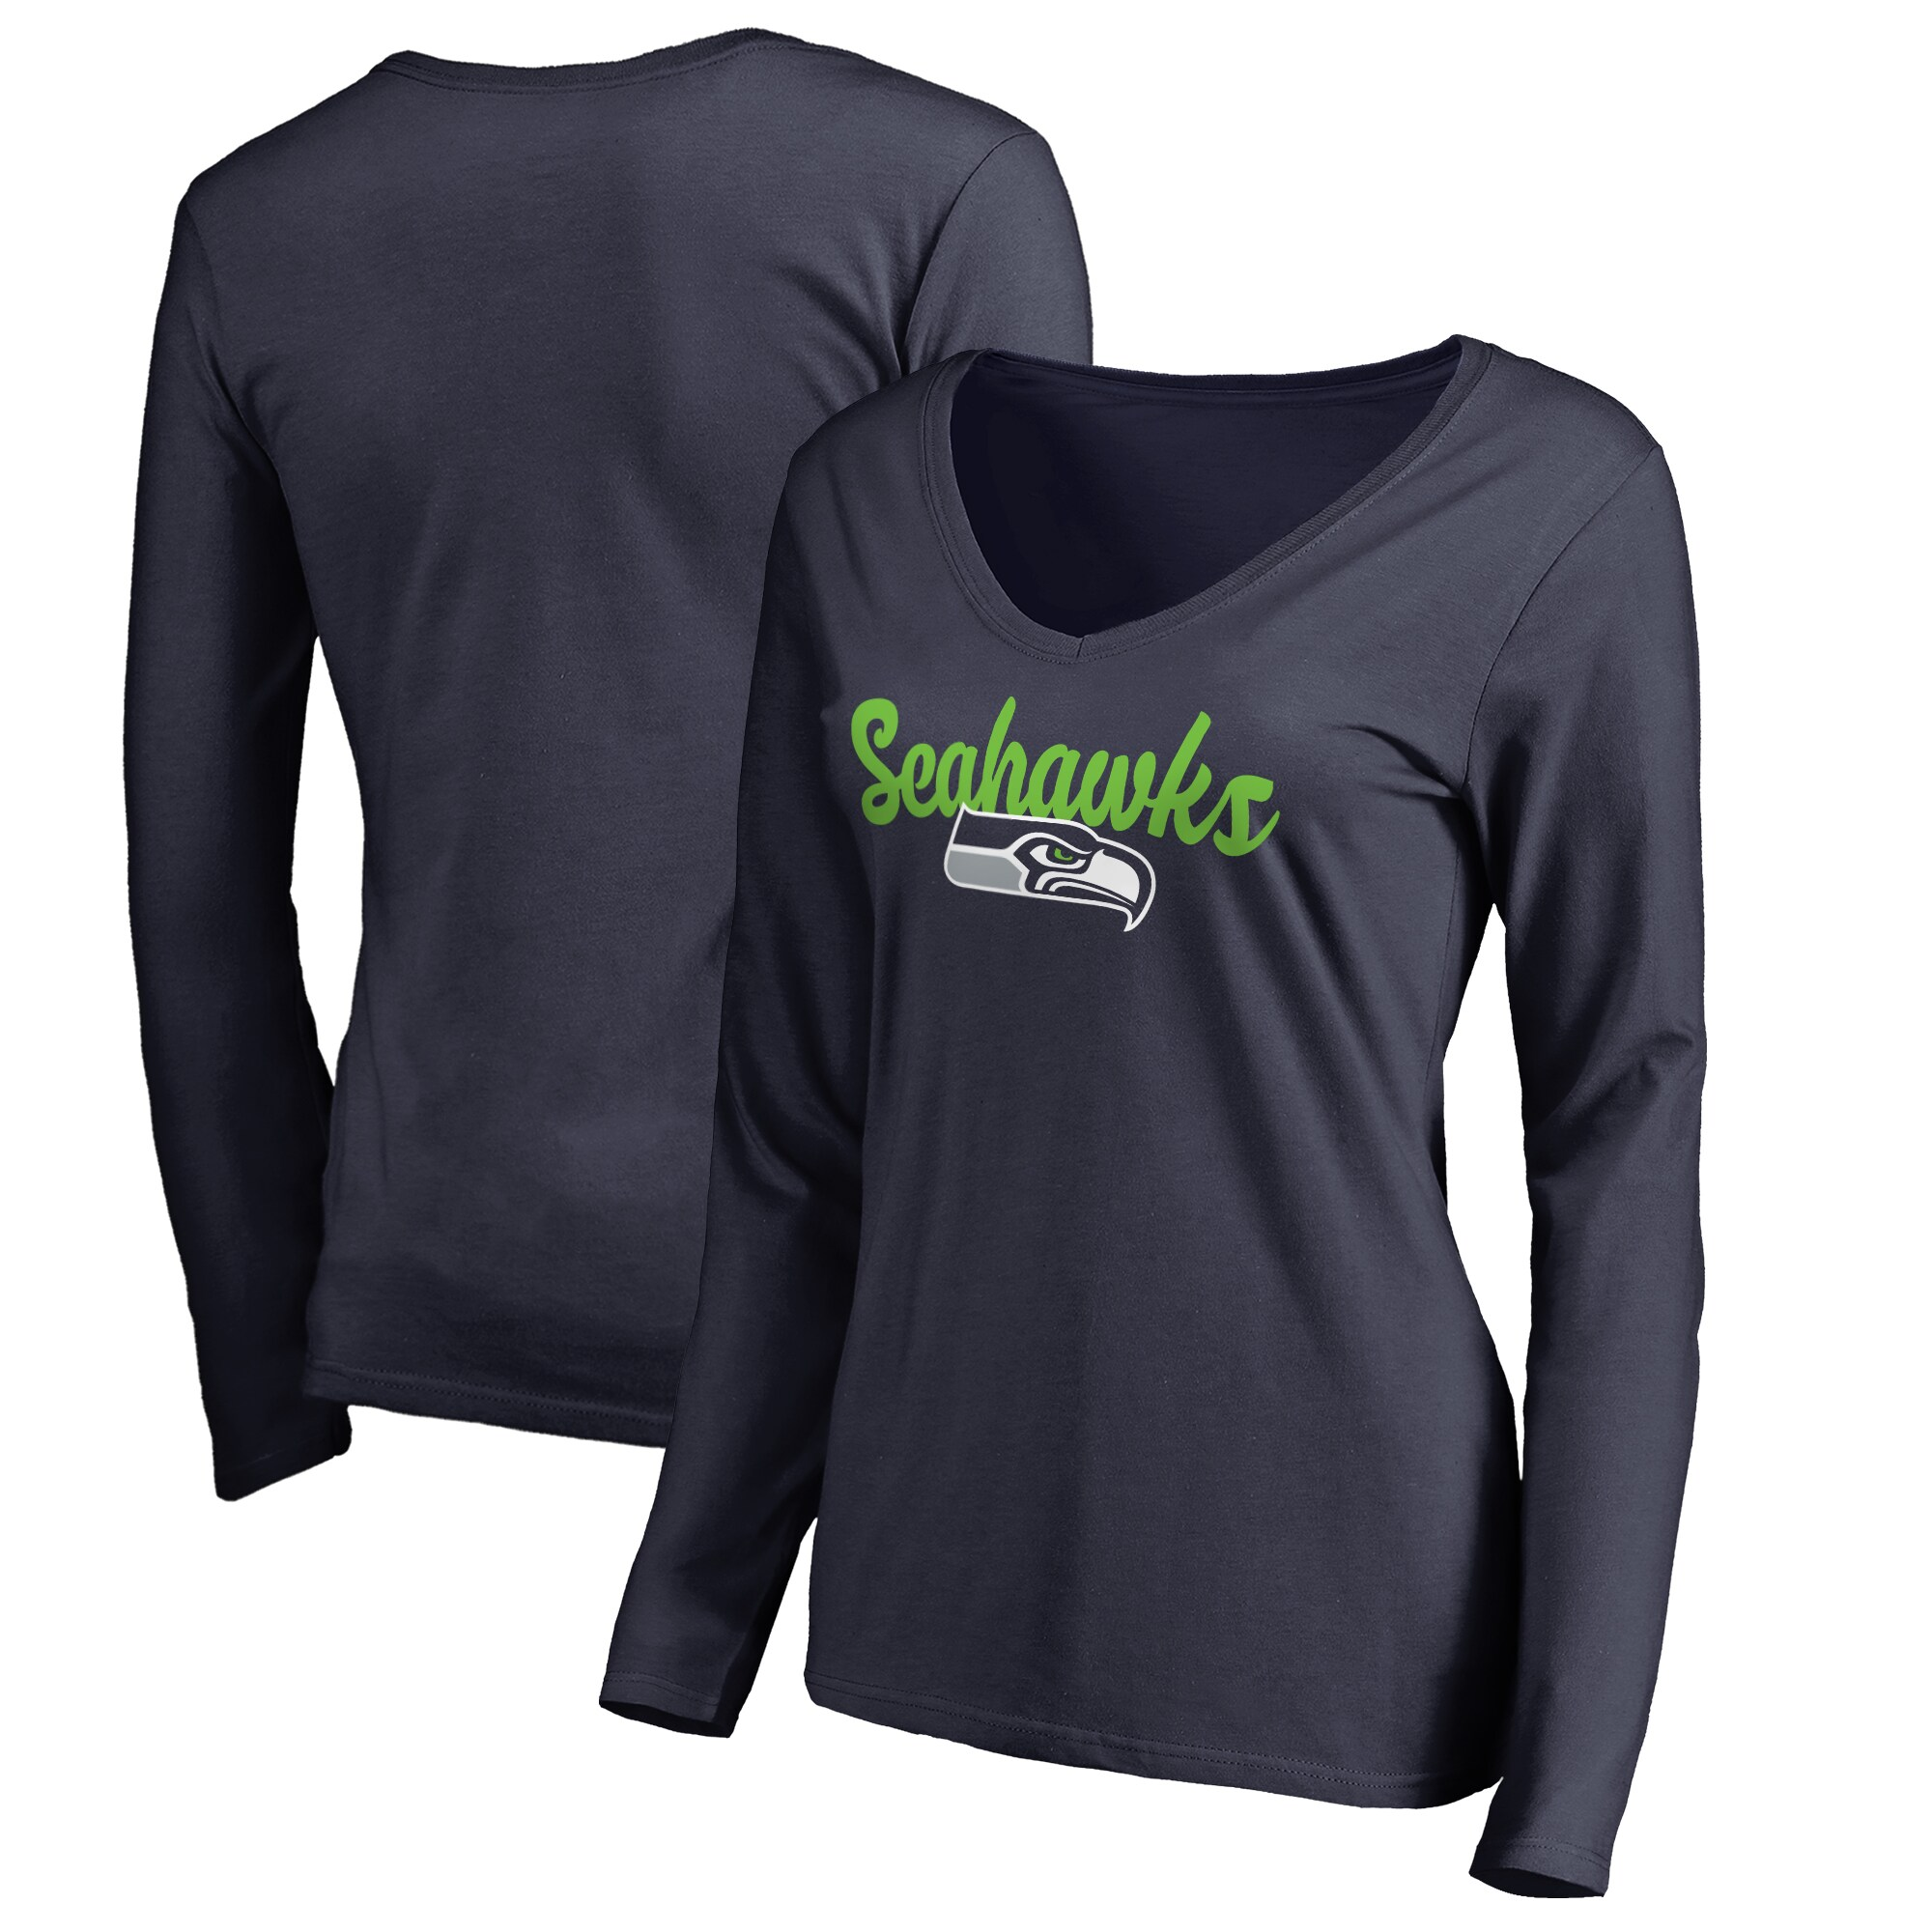 Seattle Seahawks Women's Plus Sizes Freehand Long Sleeve T-Shirt - Navy